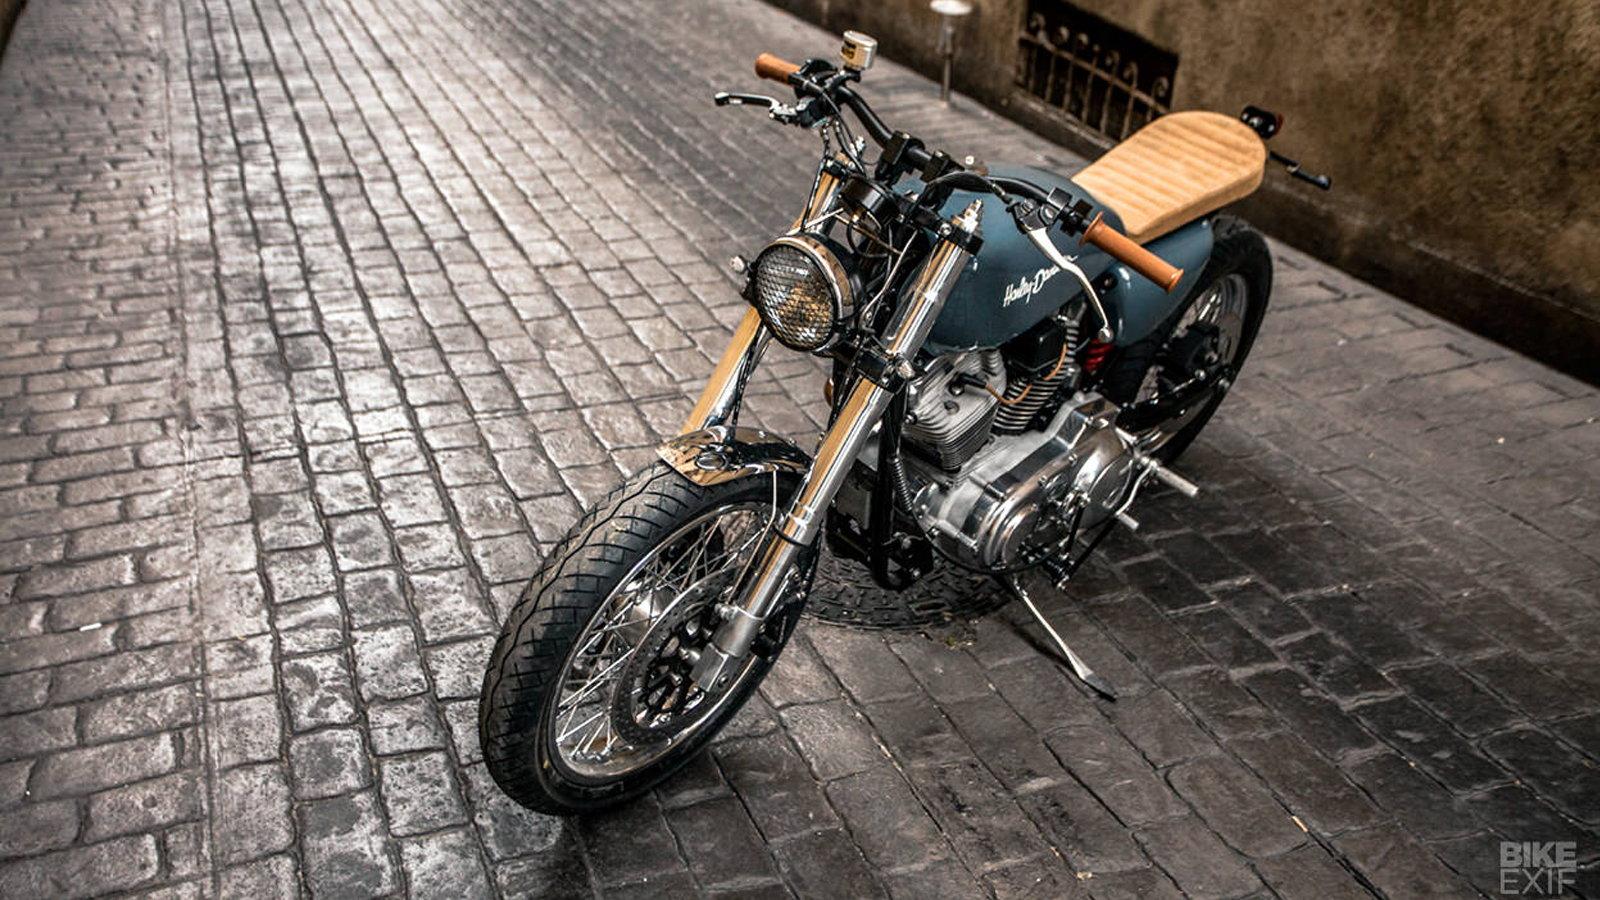 Harley-Davidson Sportster Cafe Racer by XTR Pepo